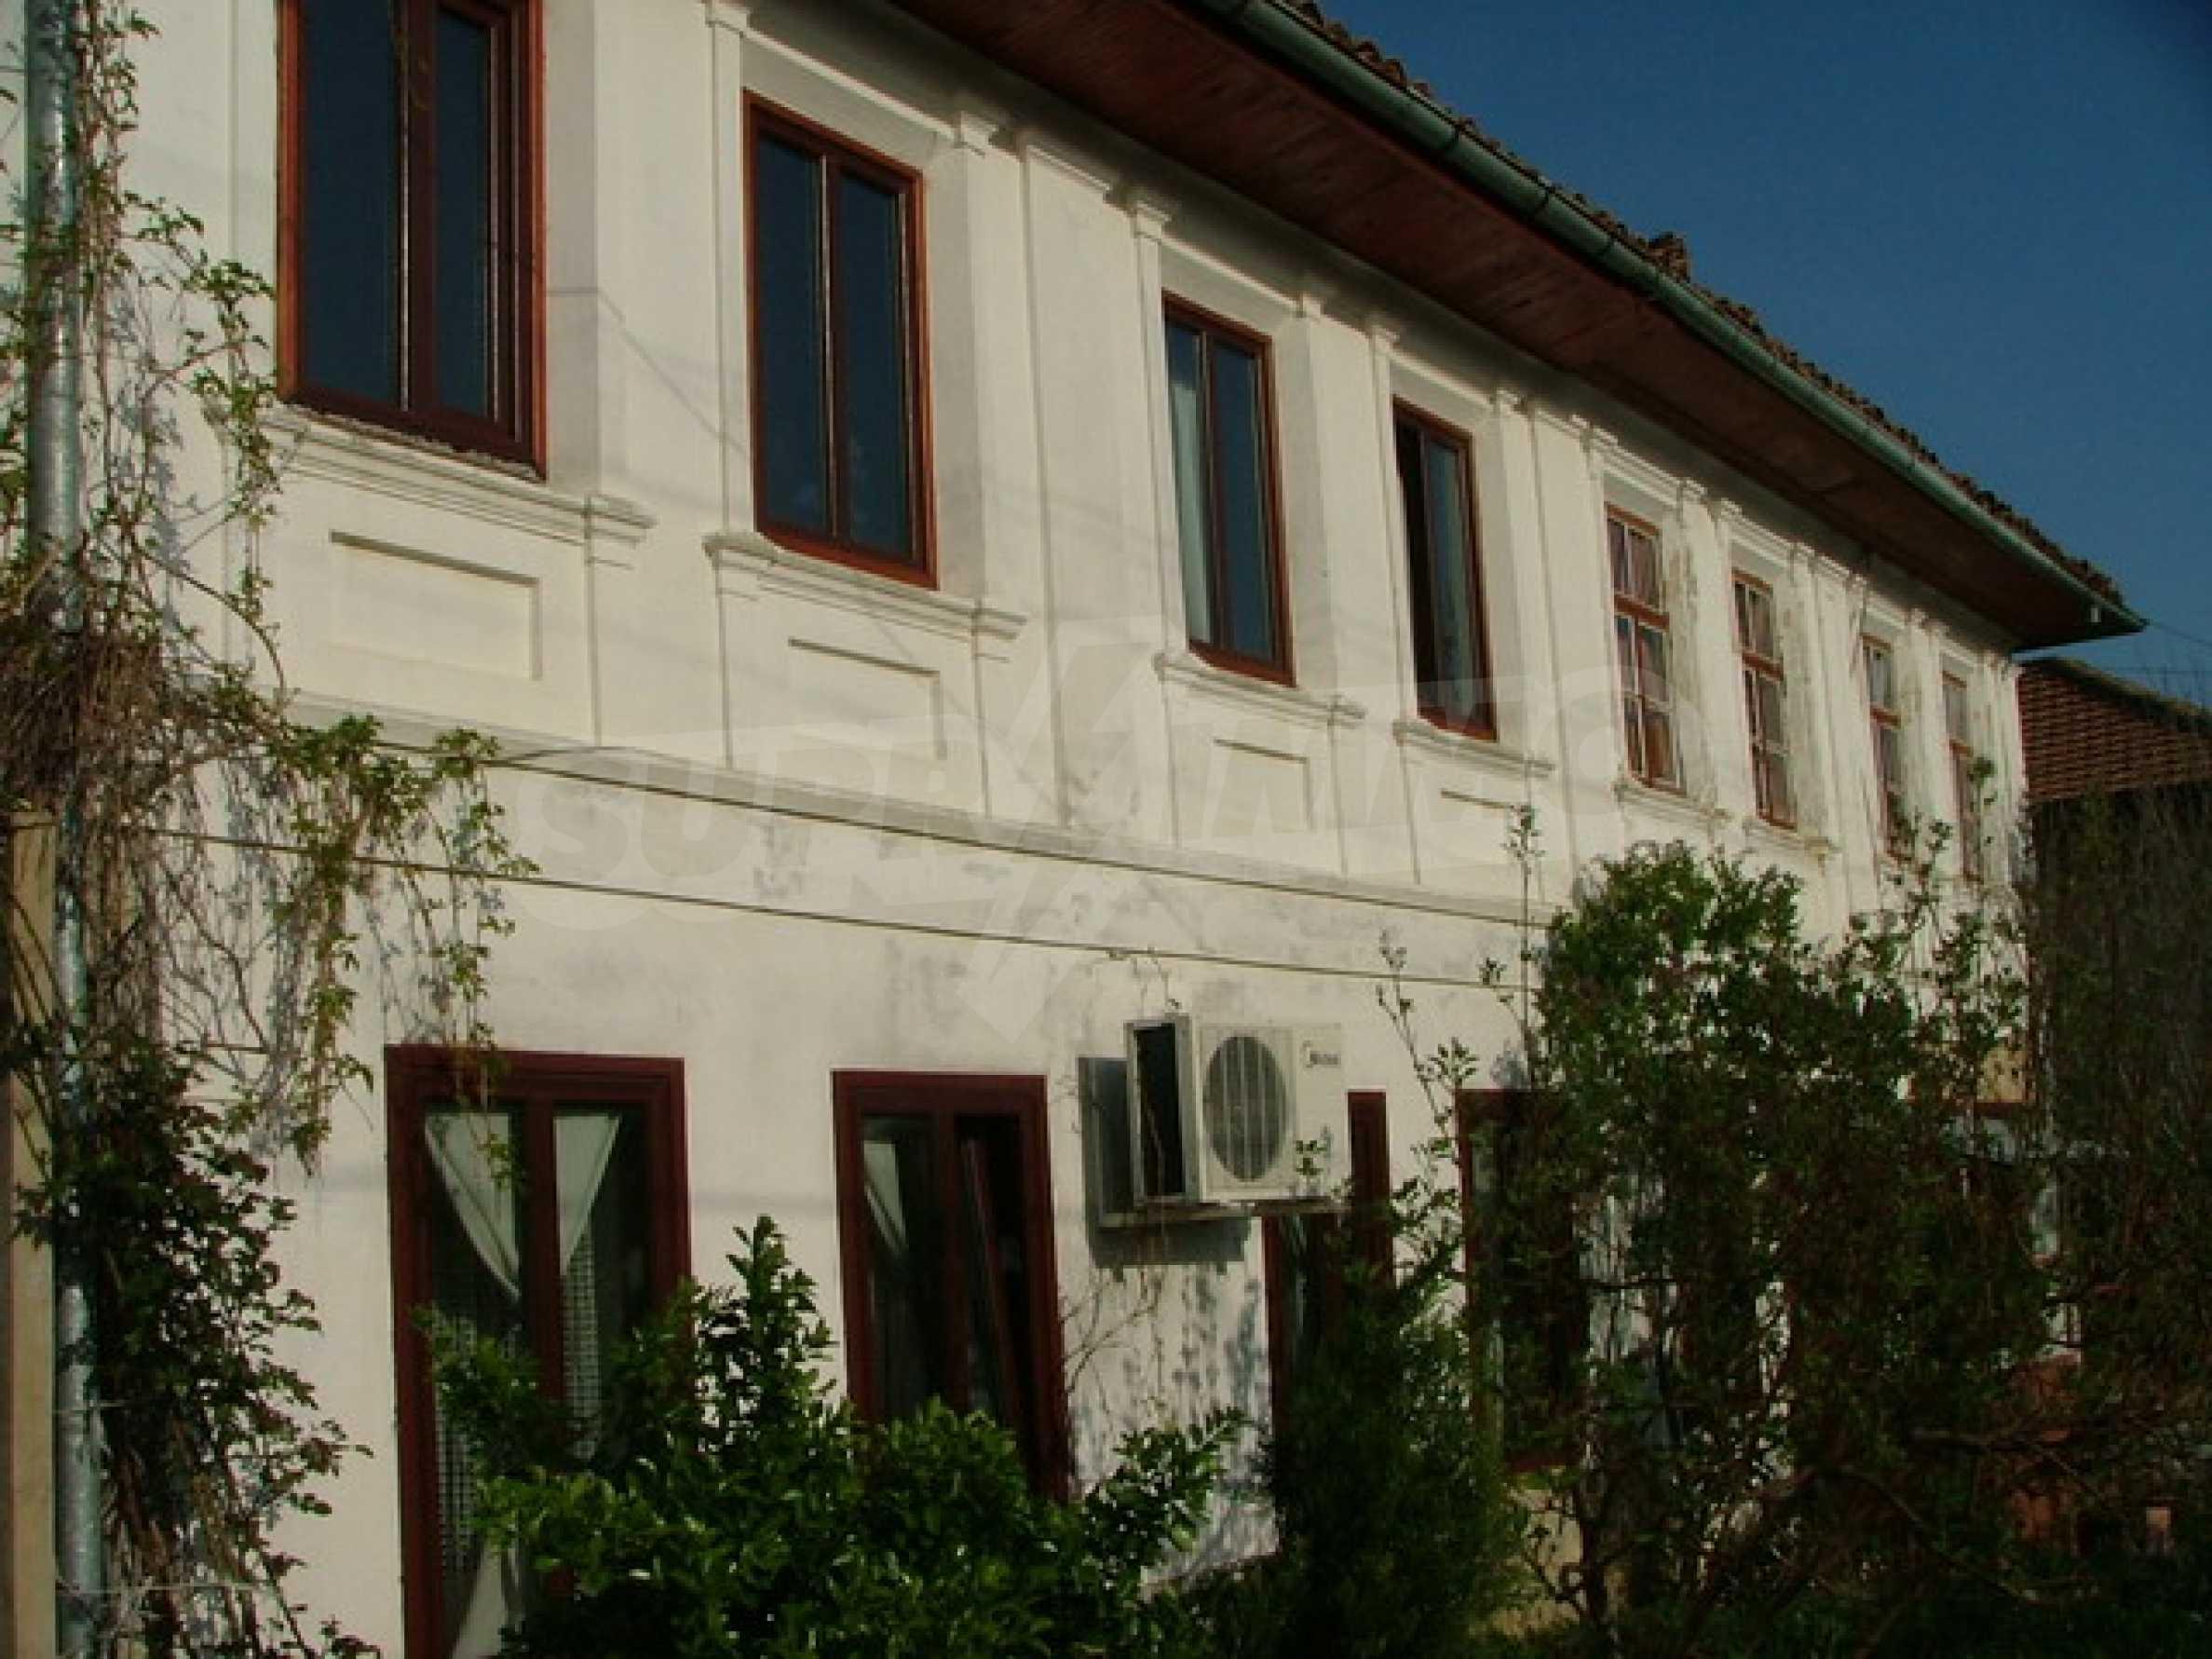 Stilvoll renovierte Villa 12 km entfernt. von Veliko Tarnovo 31